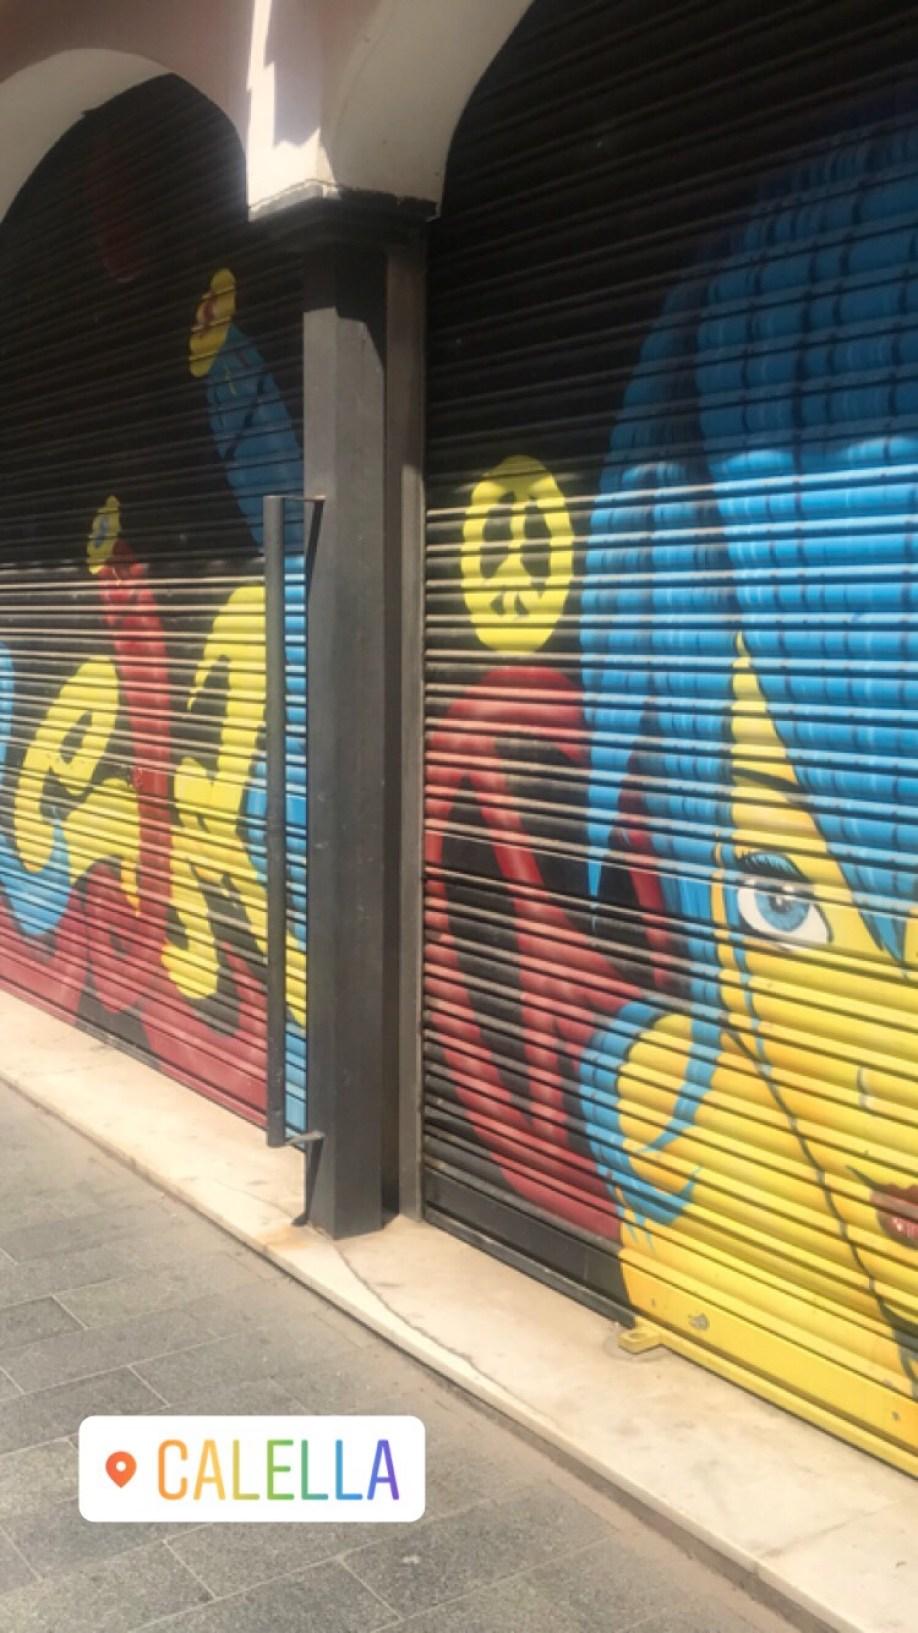 street art in Calella